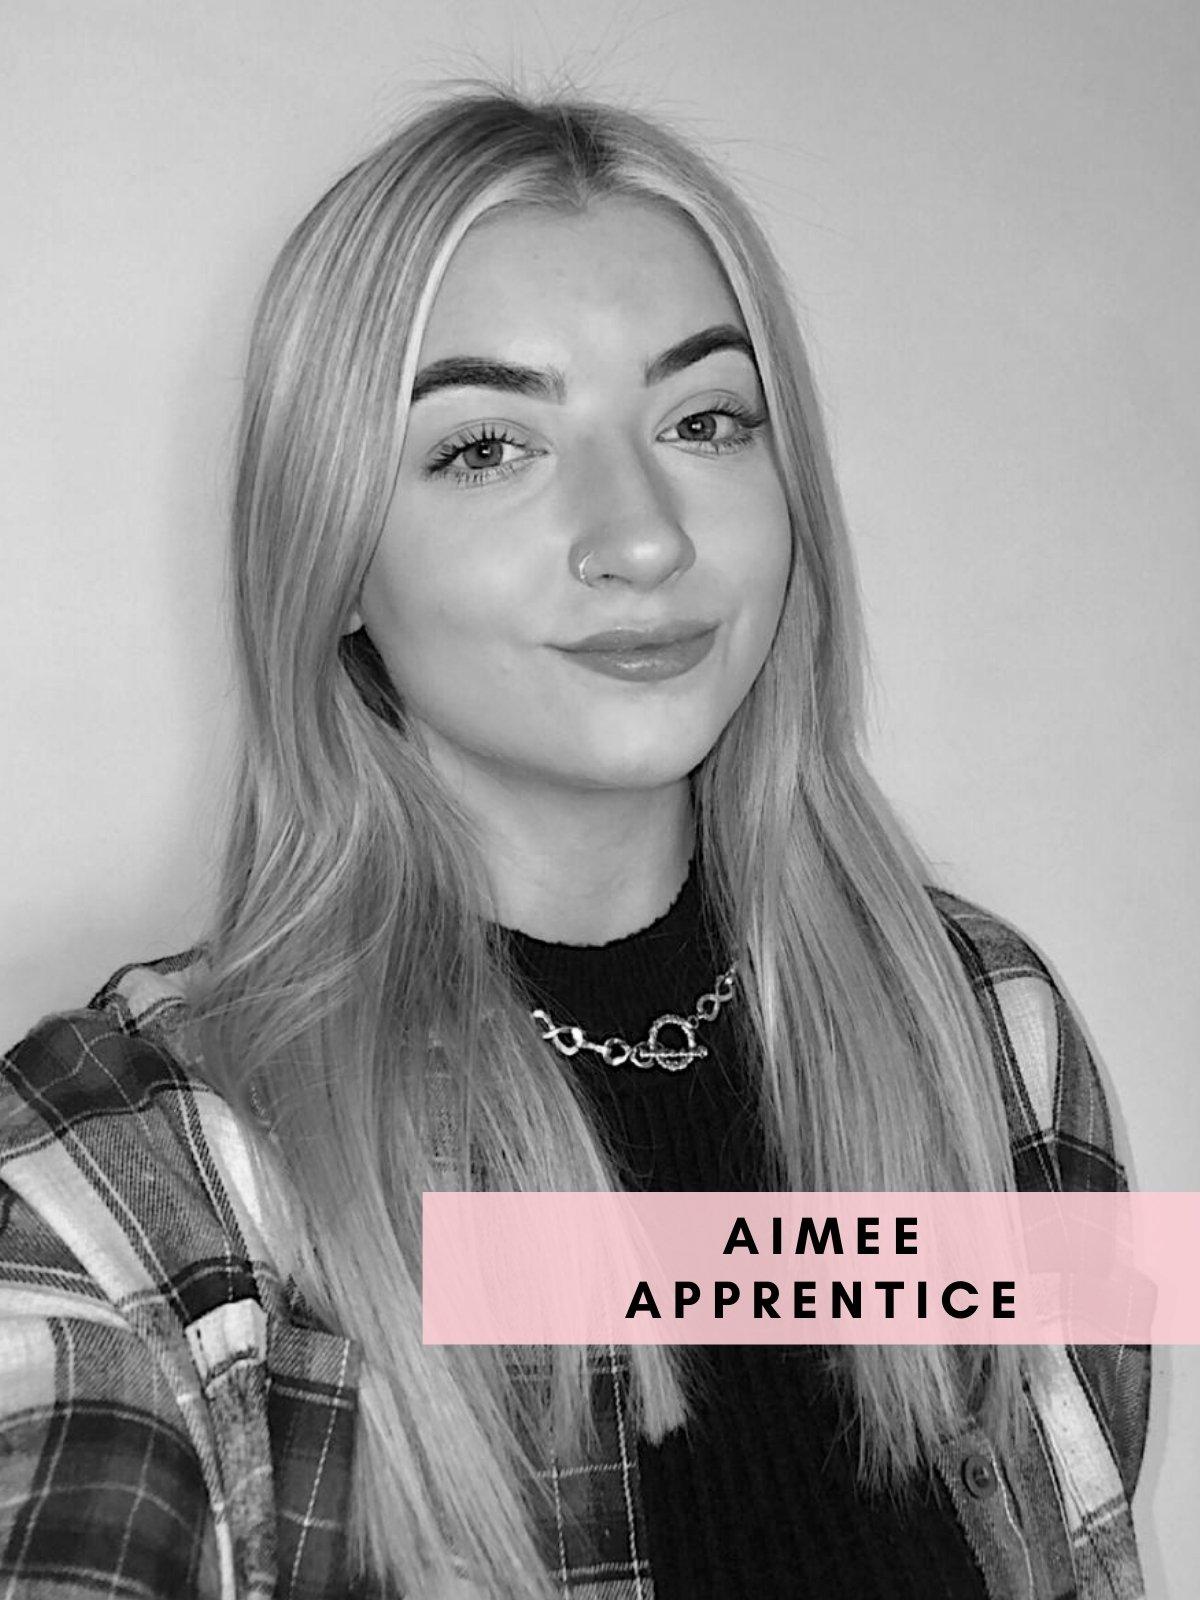 Aimee – Apprentice